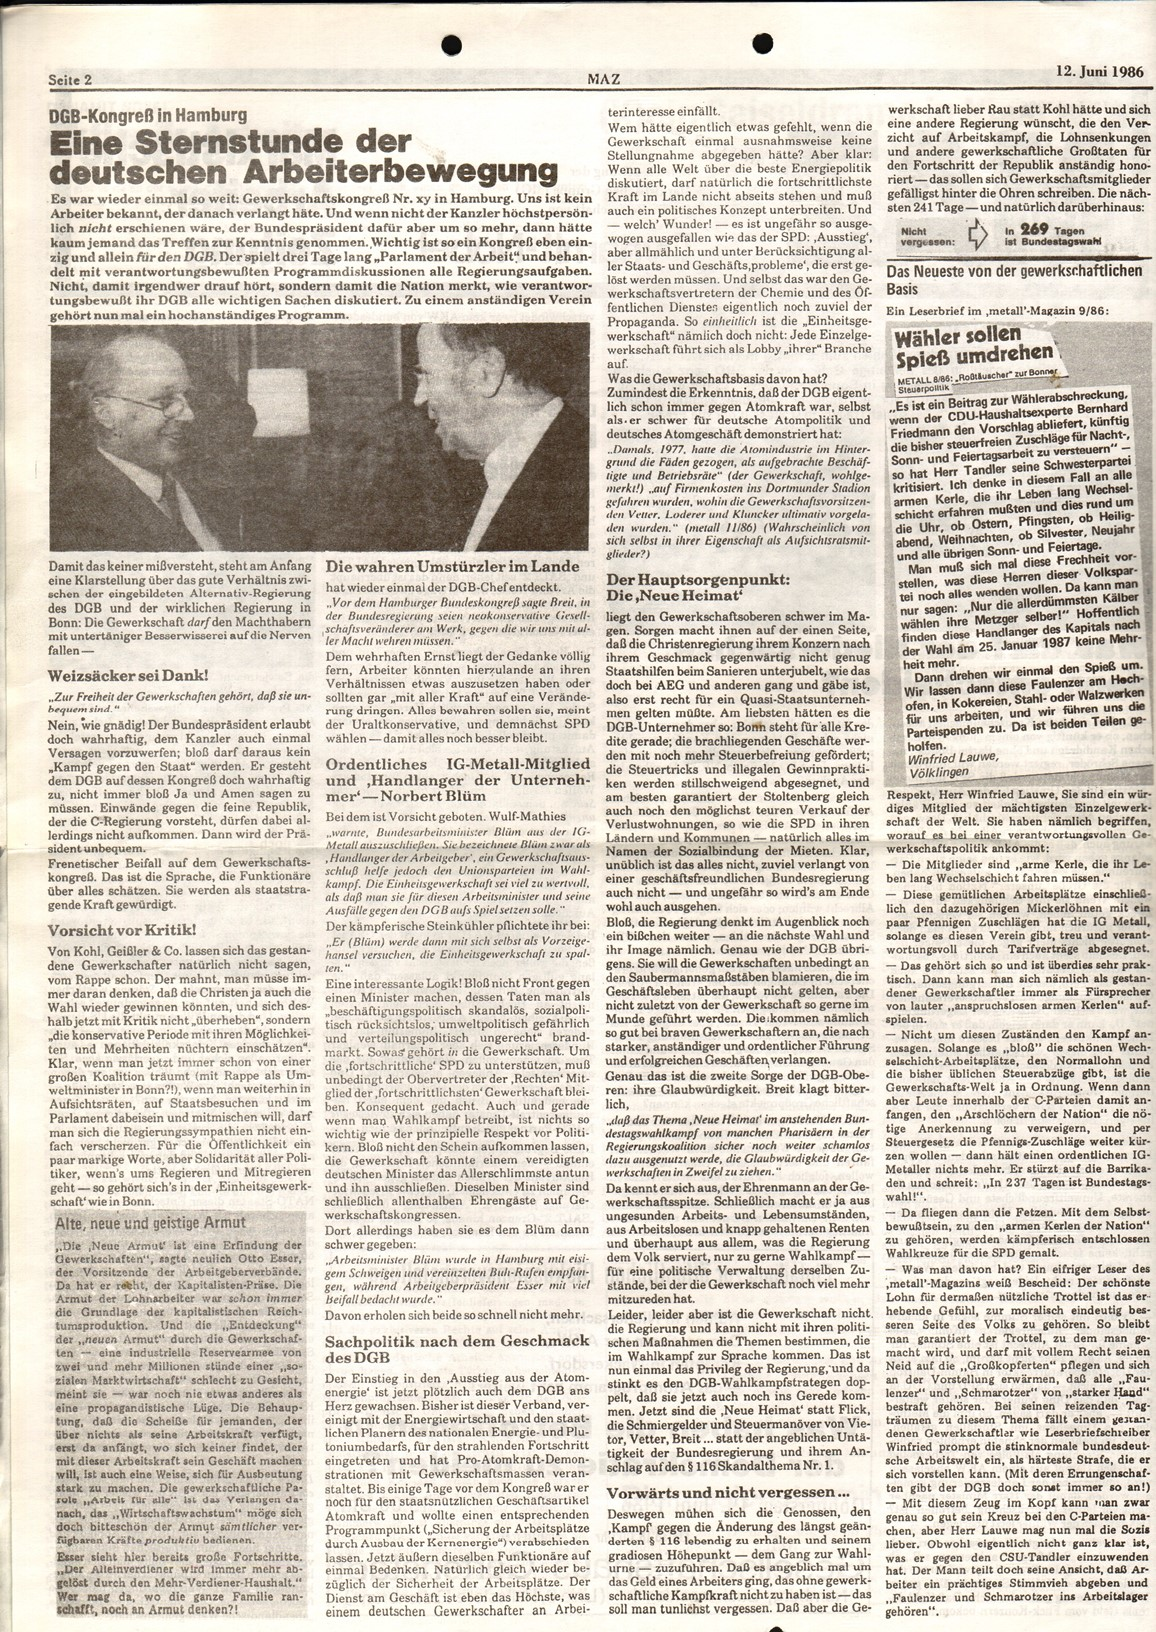 Fuerth_MG_MAZ_Dynamit_Nobel_19860612_02